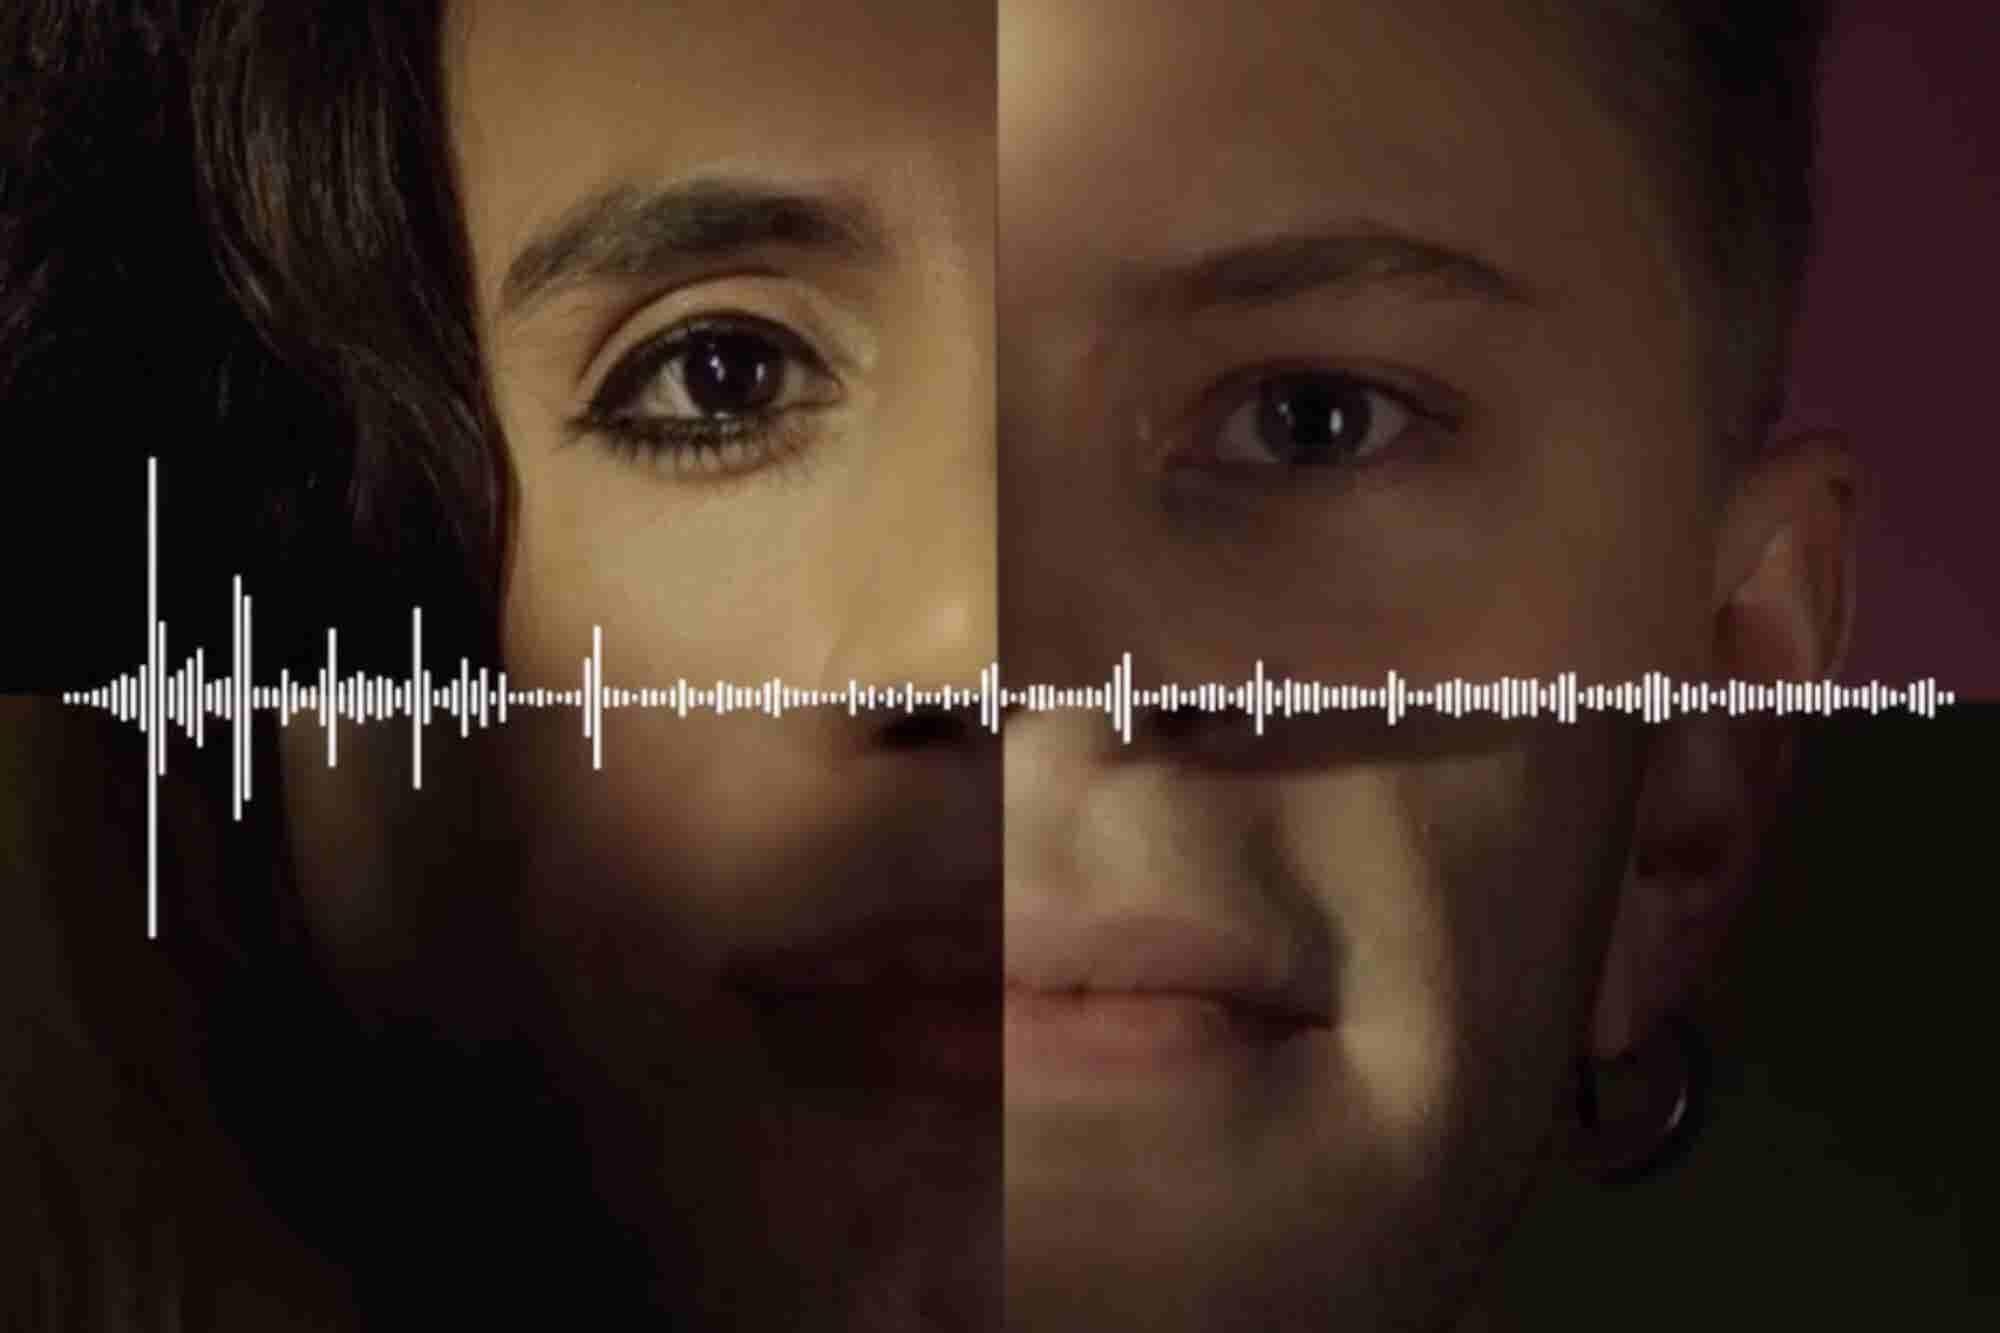 The Genderless Voice Assistant 'Q' Needs Your Help